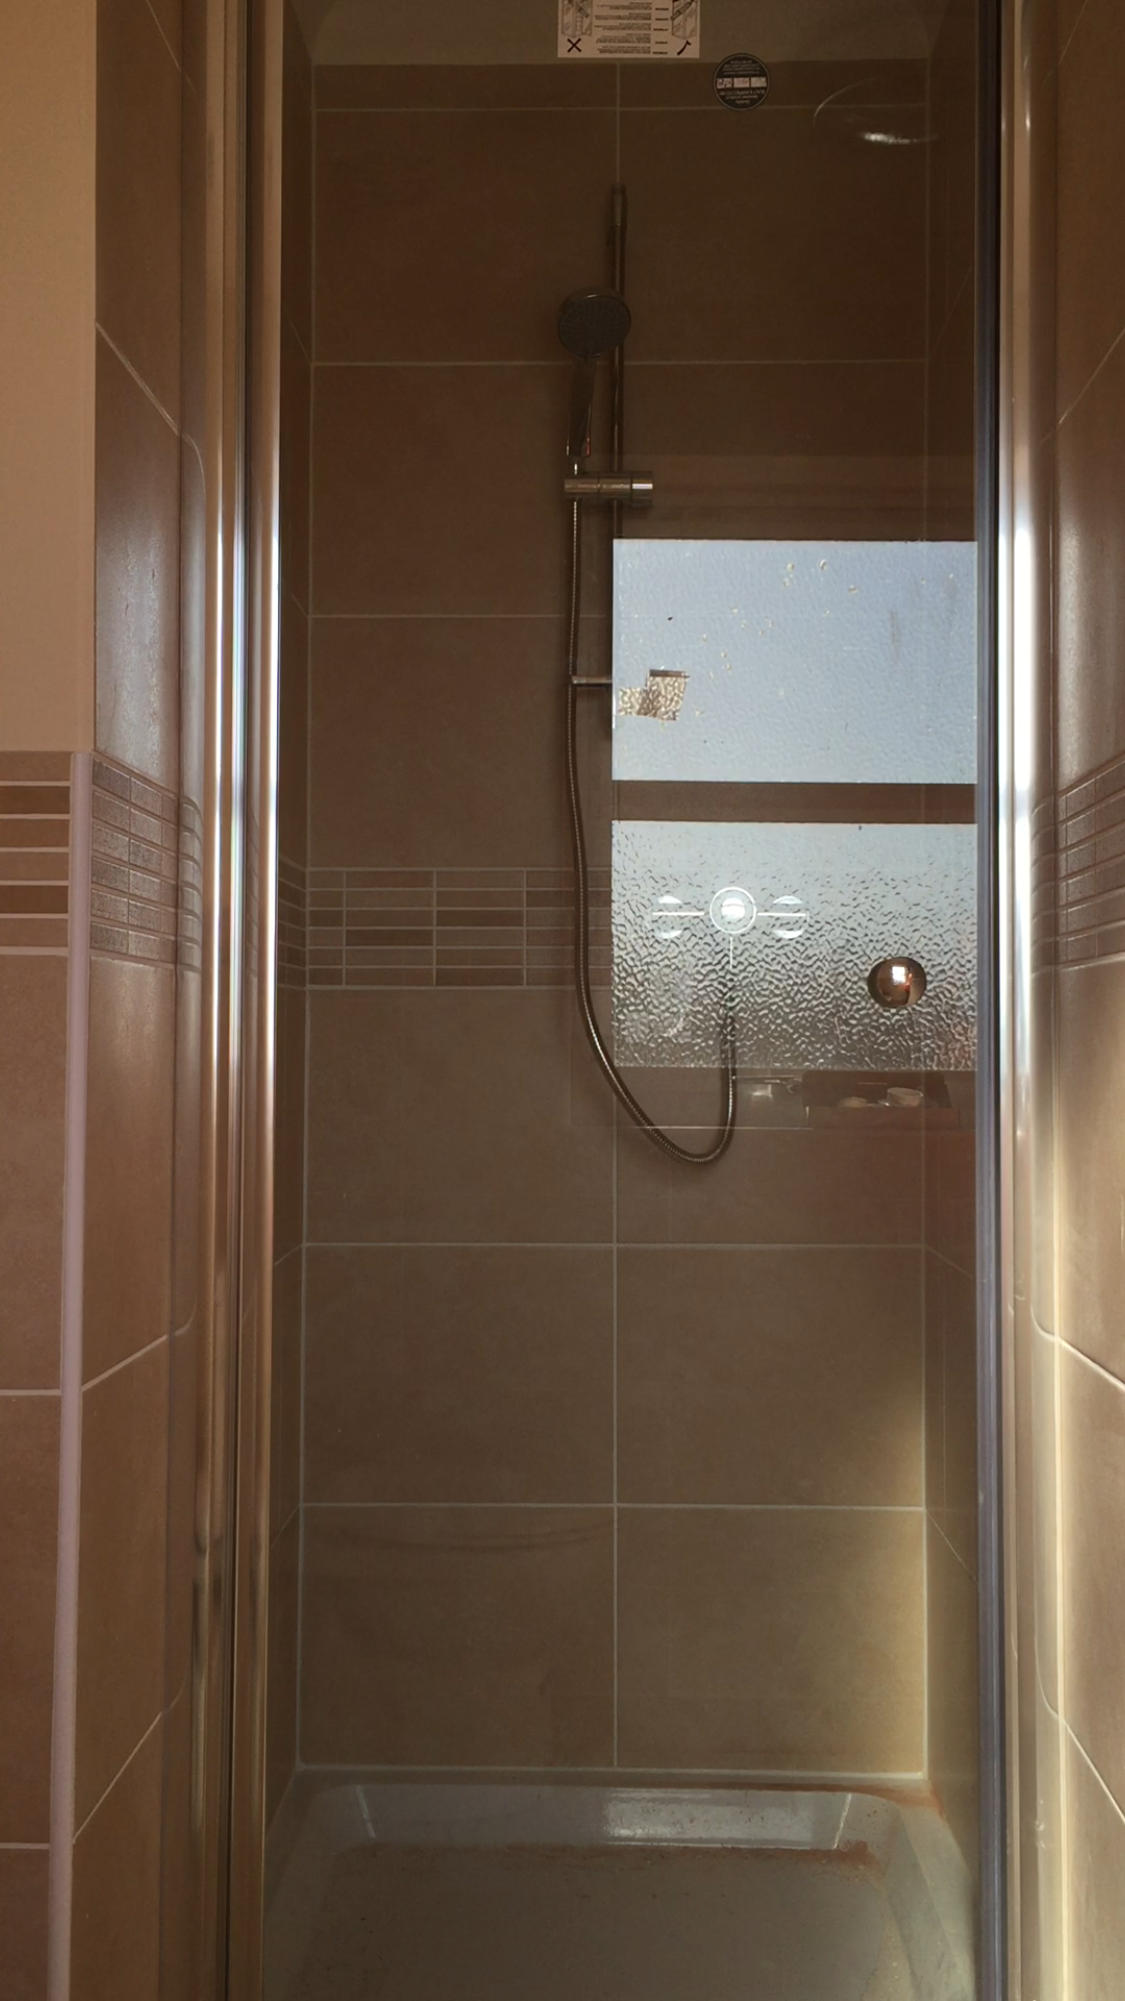 Alternative shower